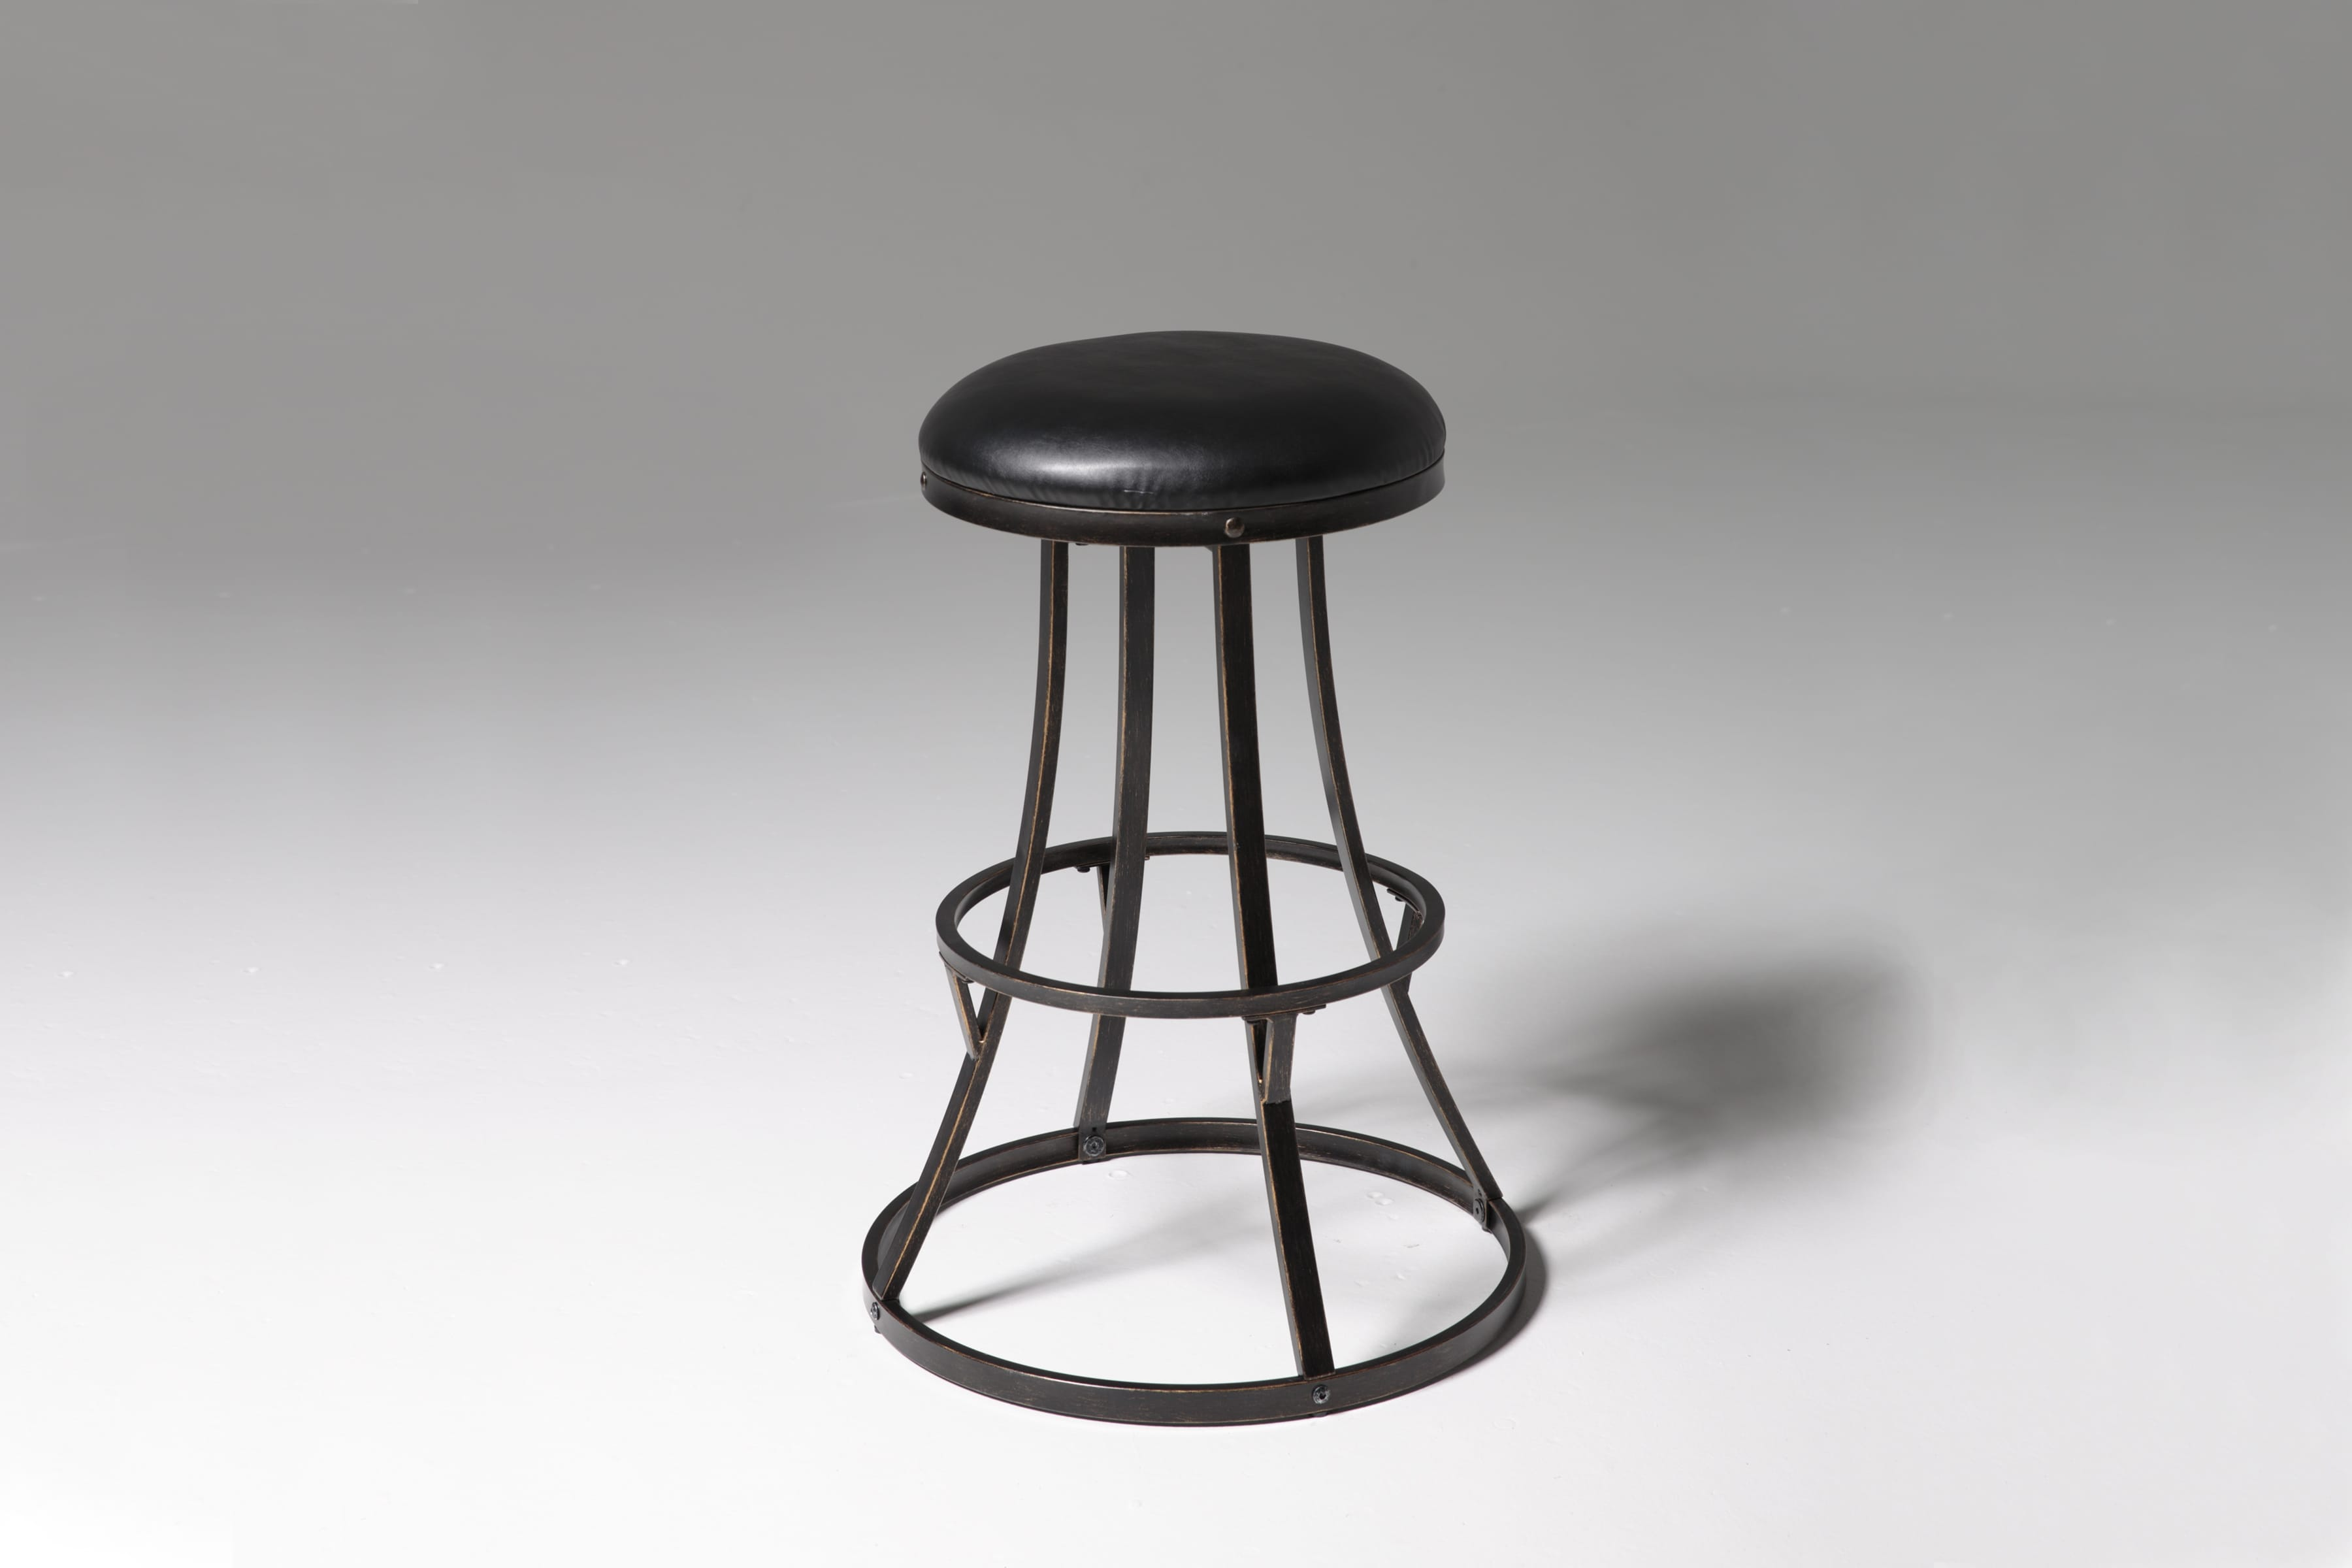 Admirable Fashion Bed Dover Bar Stool Counter Stool 30 Inch Inzonedesignstudio Interior Chair Design Inzonedesignstudiocom